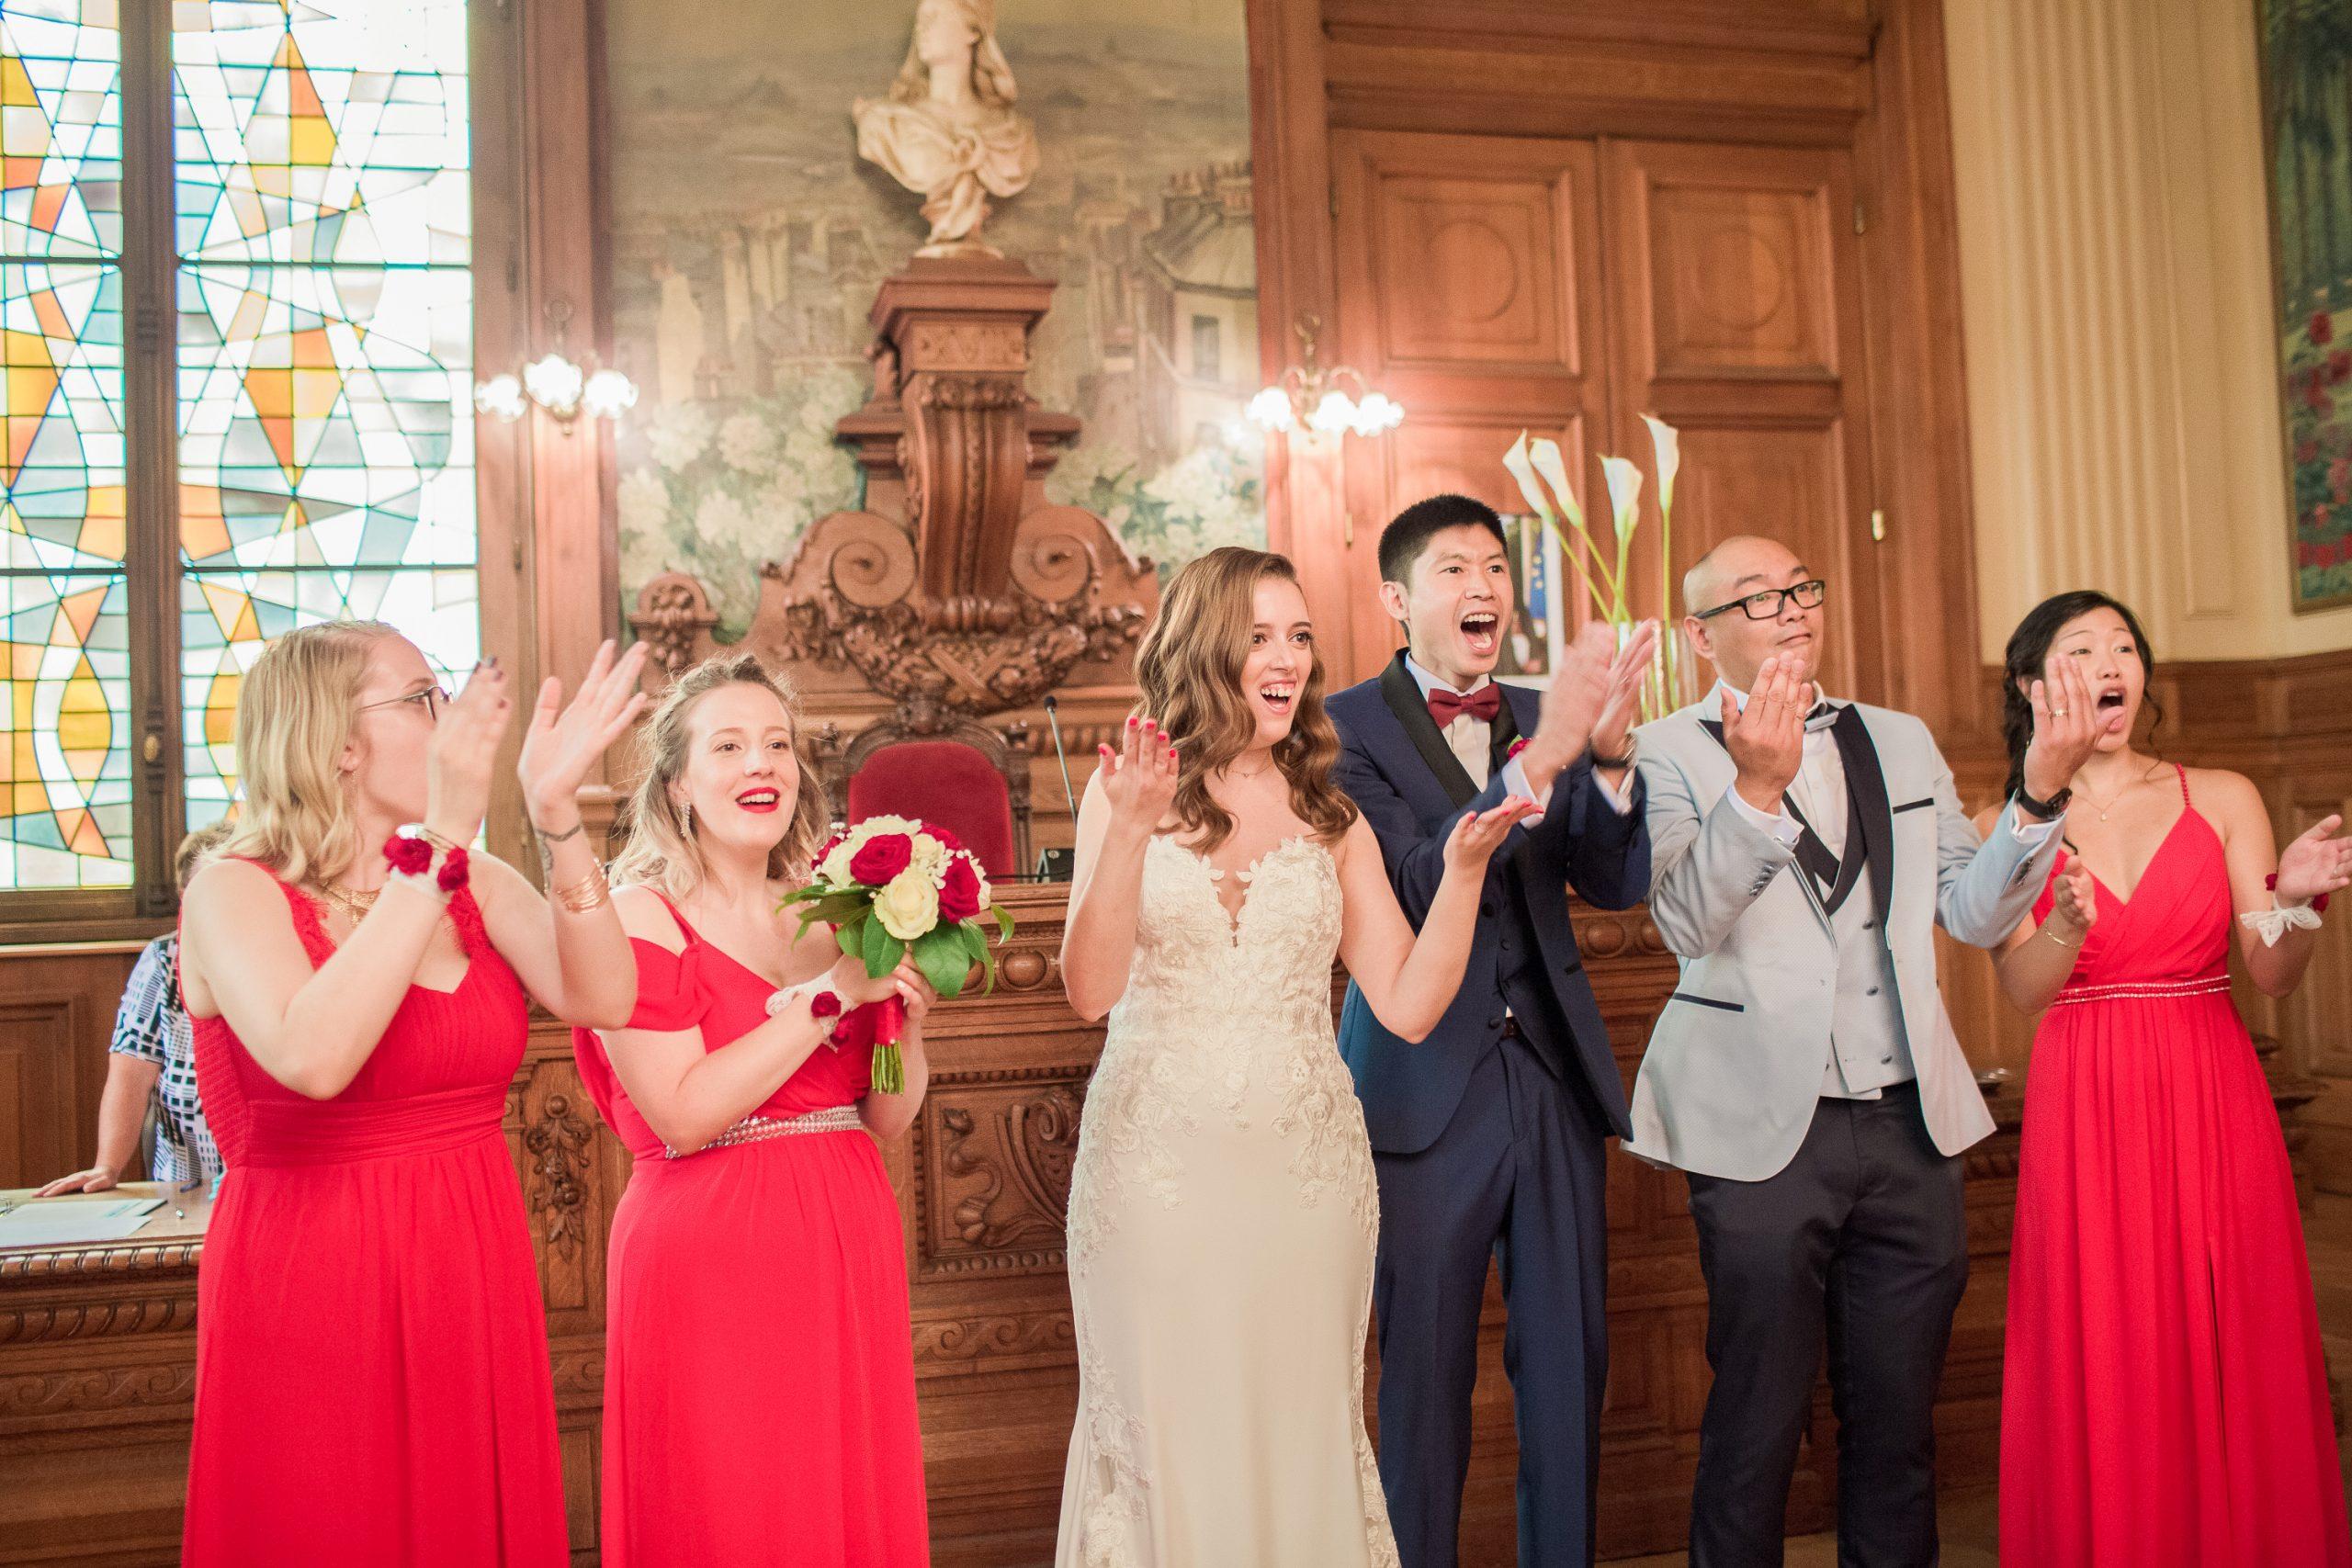 photographie-ceremonie-civile-mariage-paris-18eme